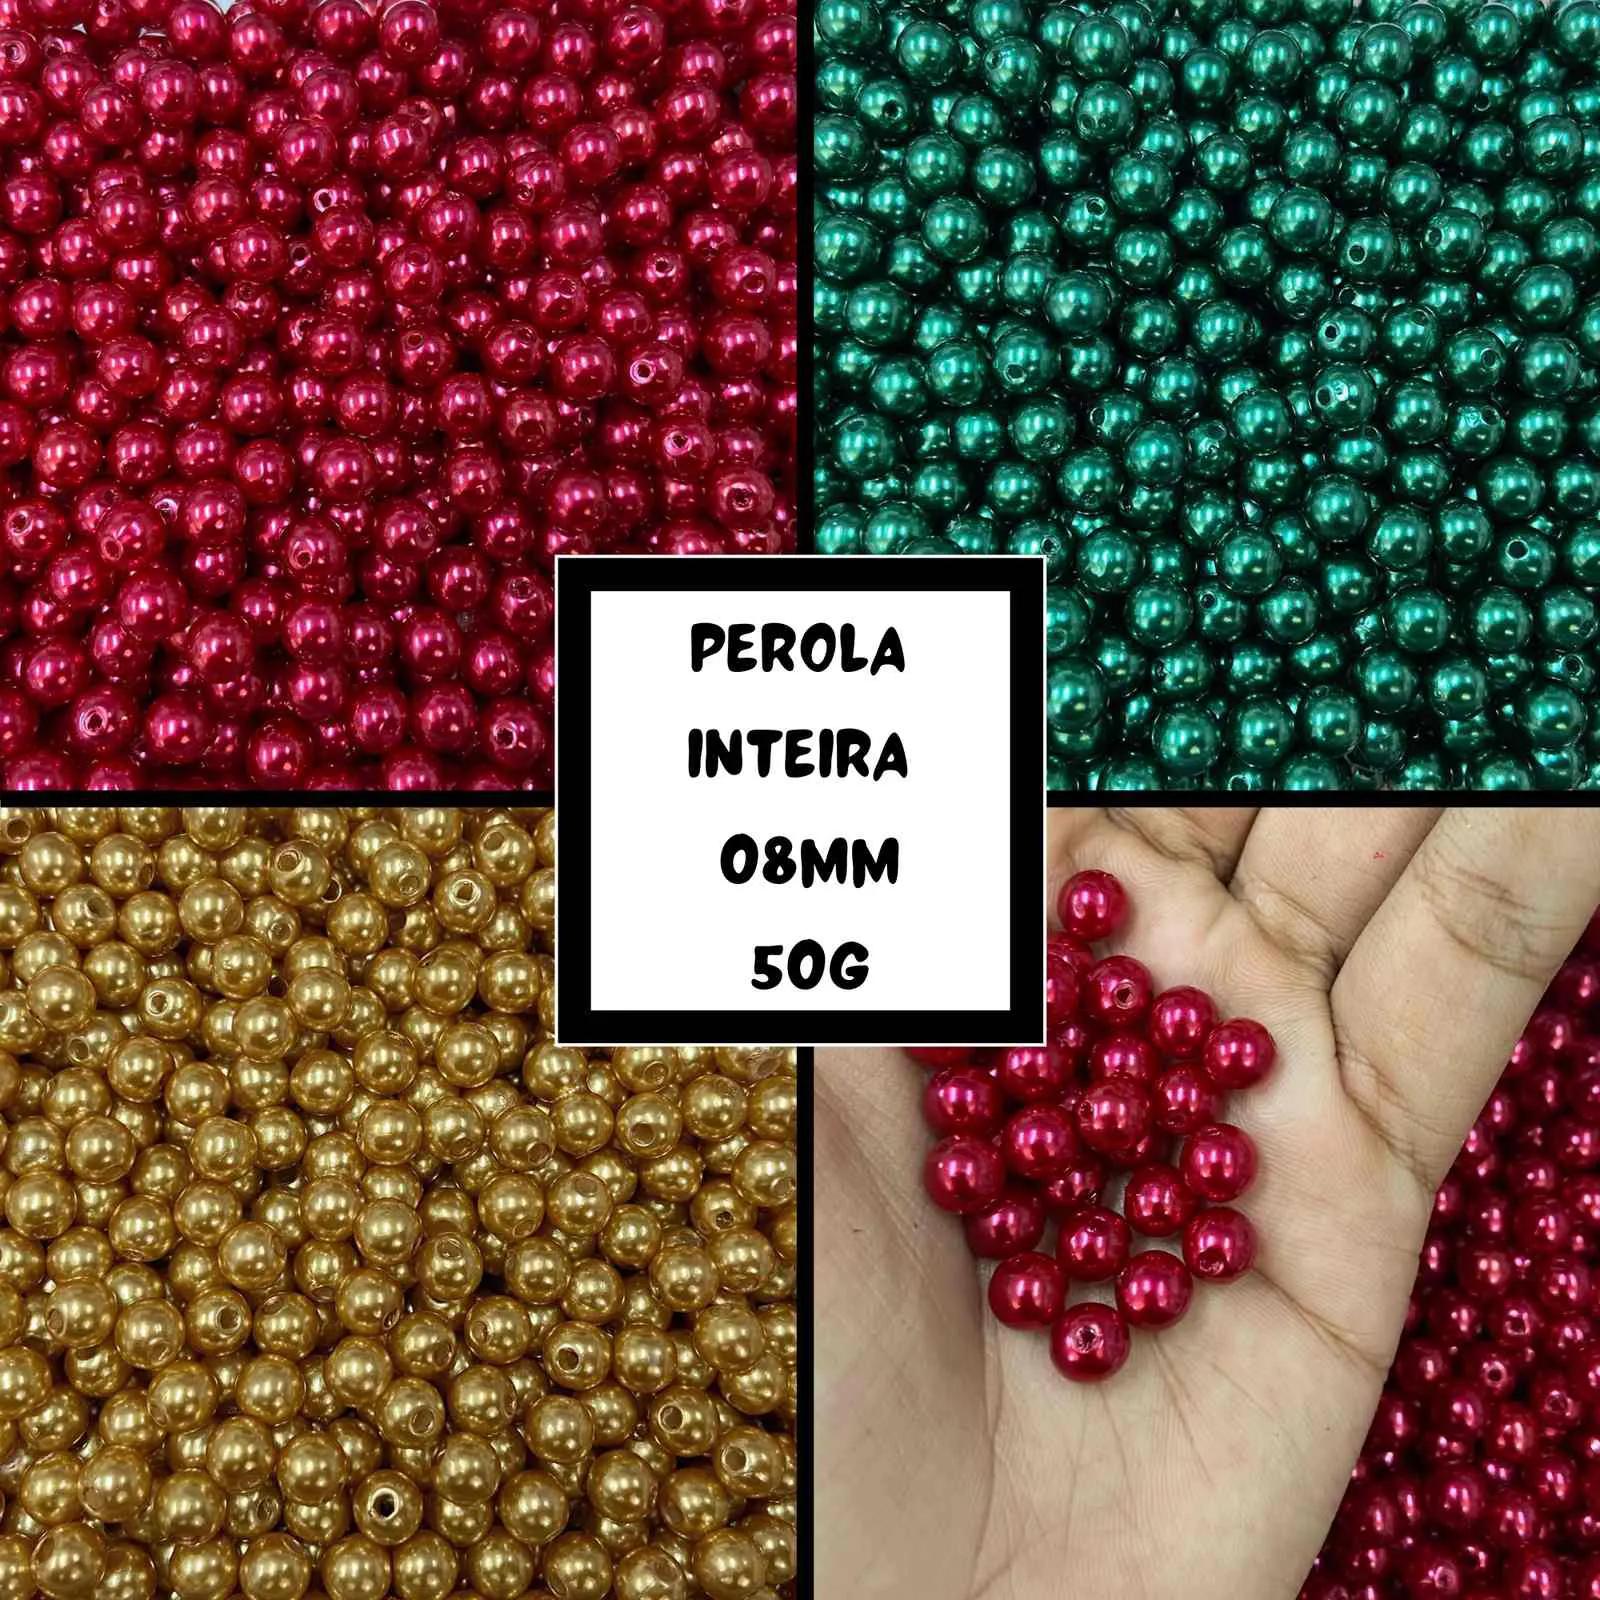 Perola Inteira 08mm - Pacote 50g